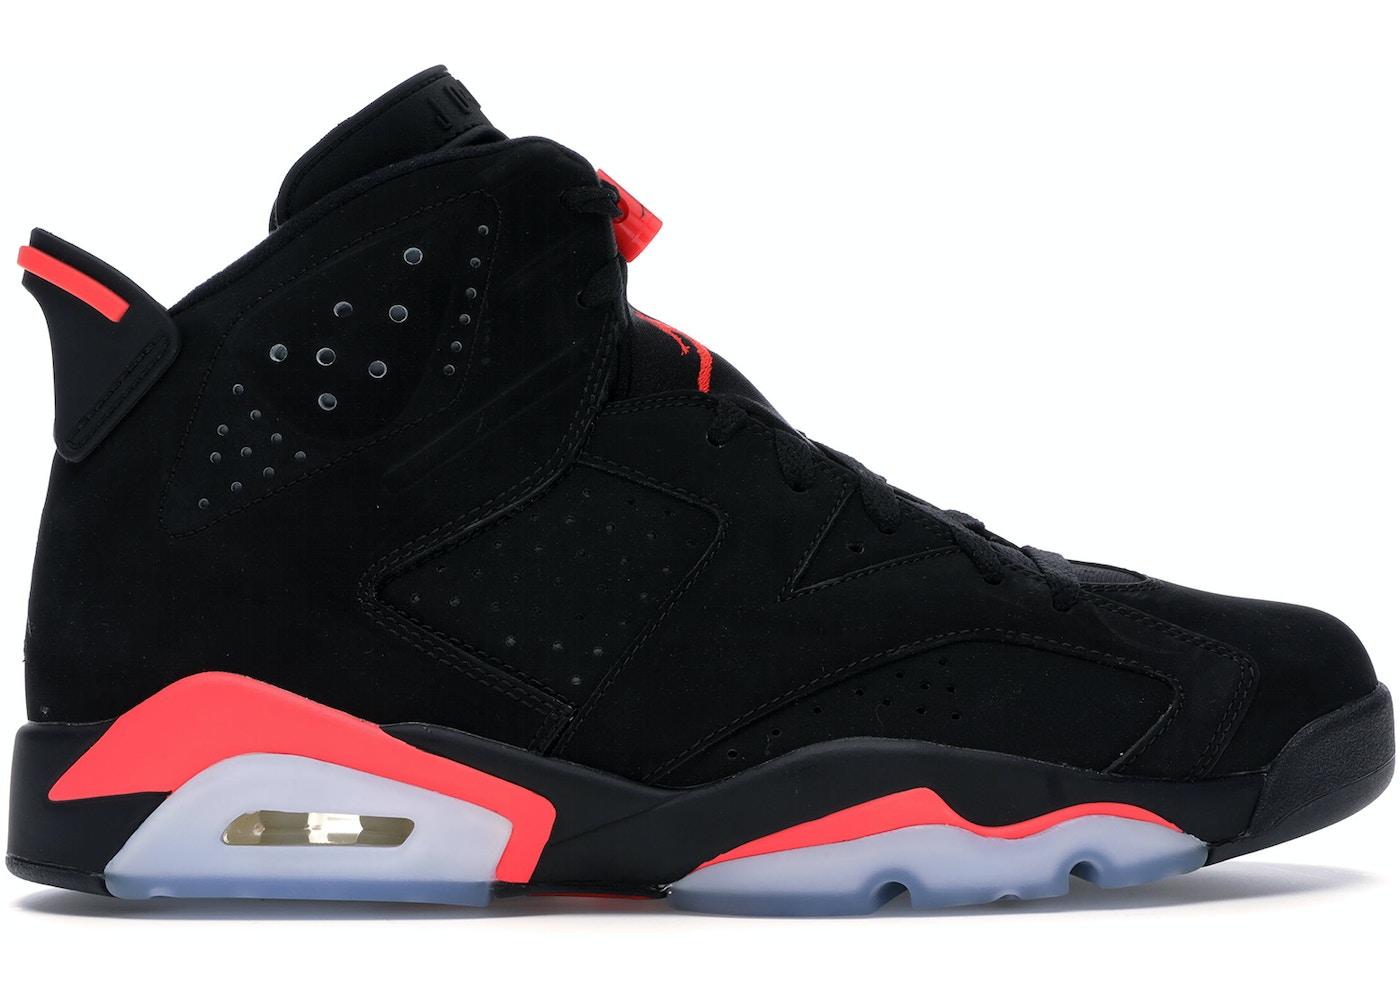 huge discount 91c23 7a771 Buy Air Jordan 6 Shoes   Deadstock Sneakers